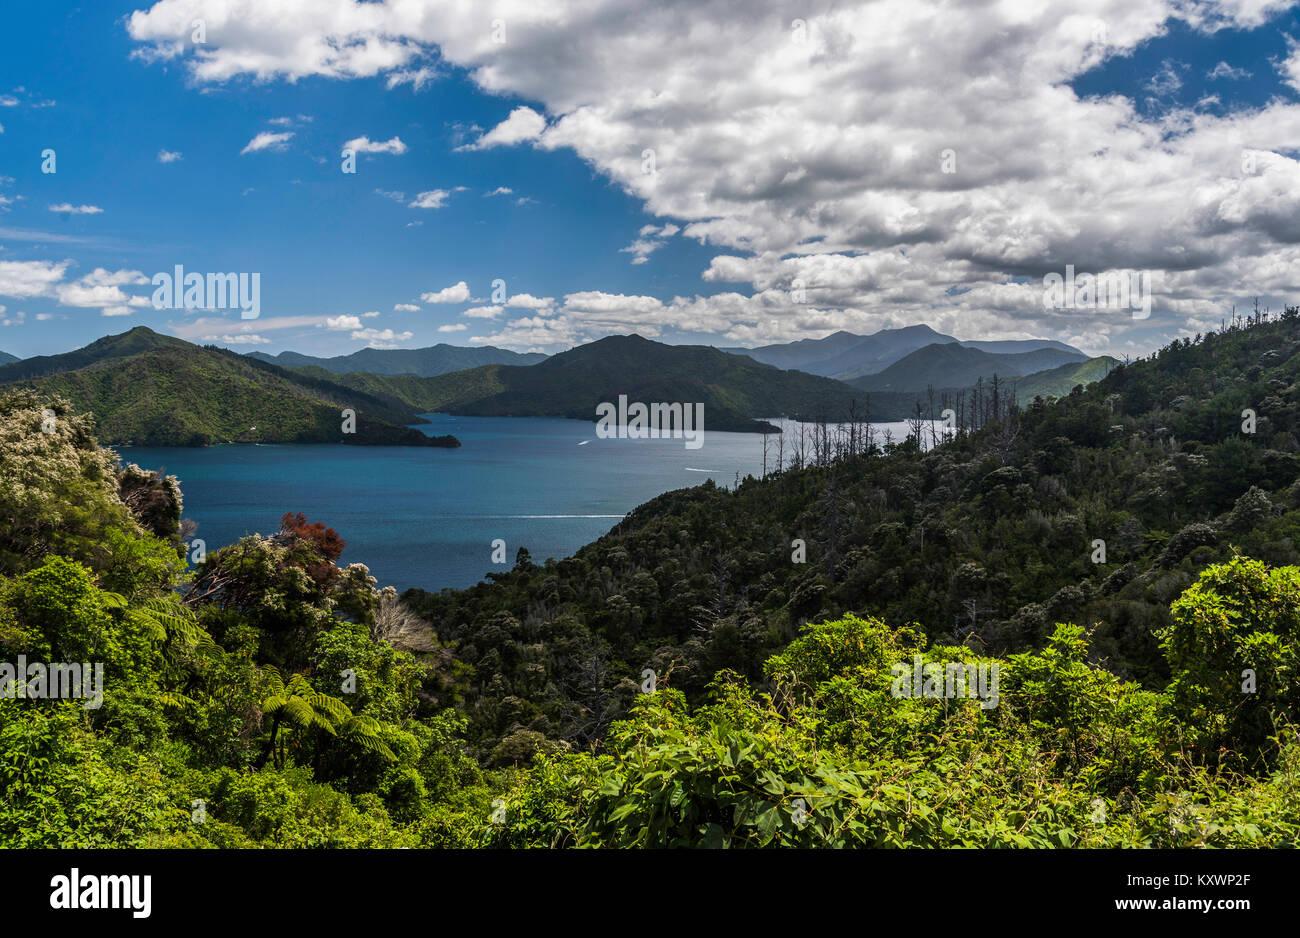 Marlborough Sound at Queen Charlotte drive, Marlborough, New Zealand - Stock Image